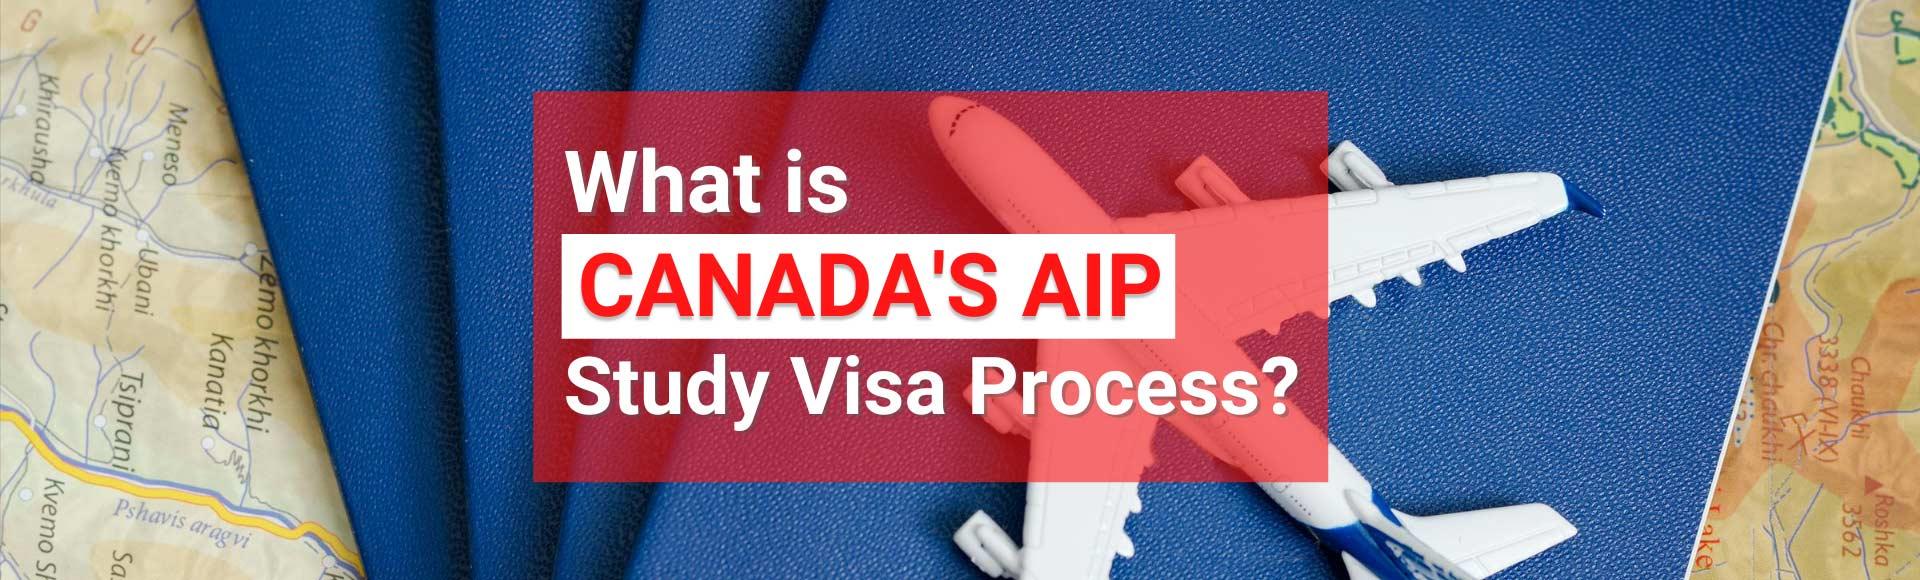 Canada's AIP Study Visa Process